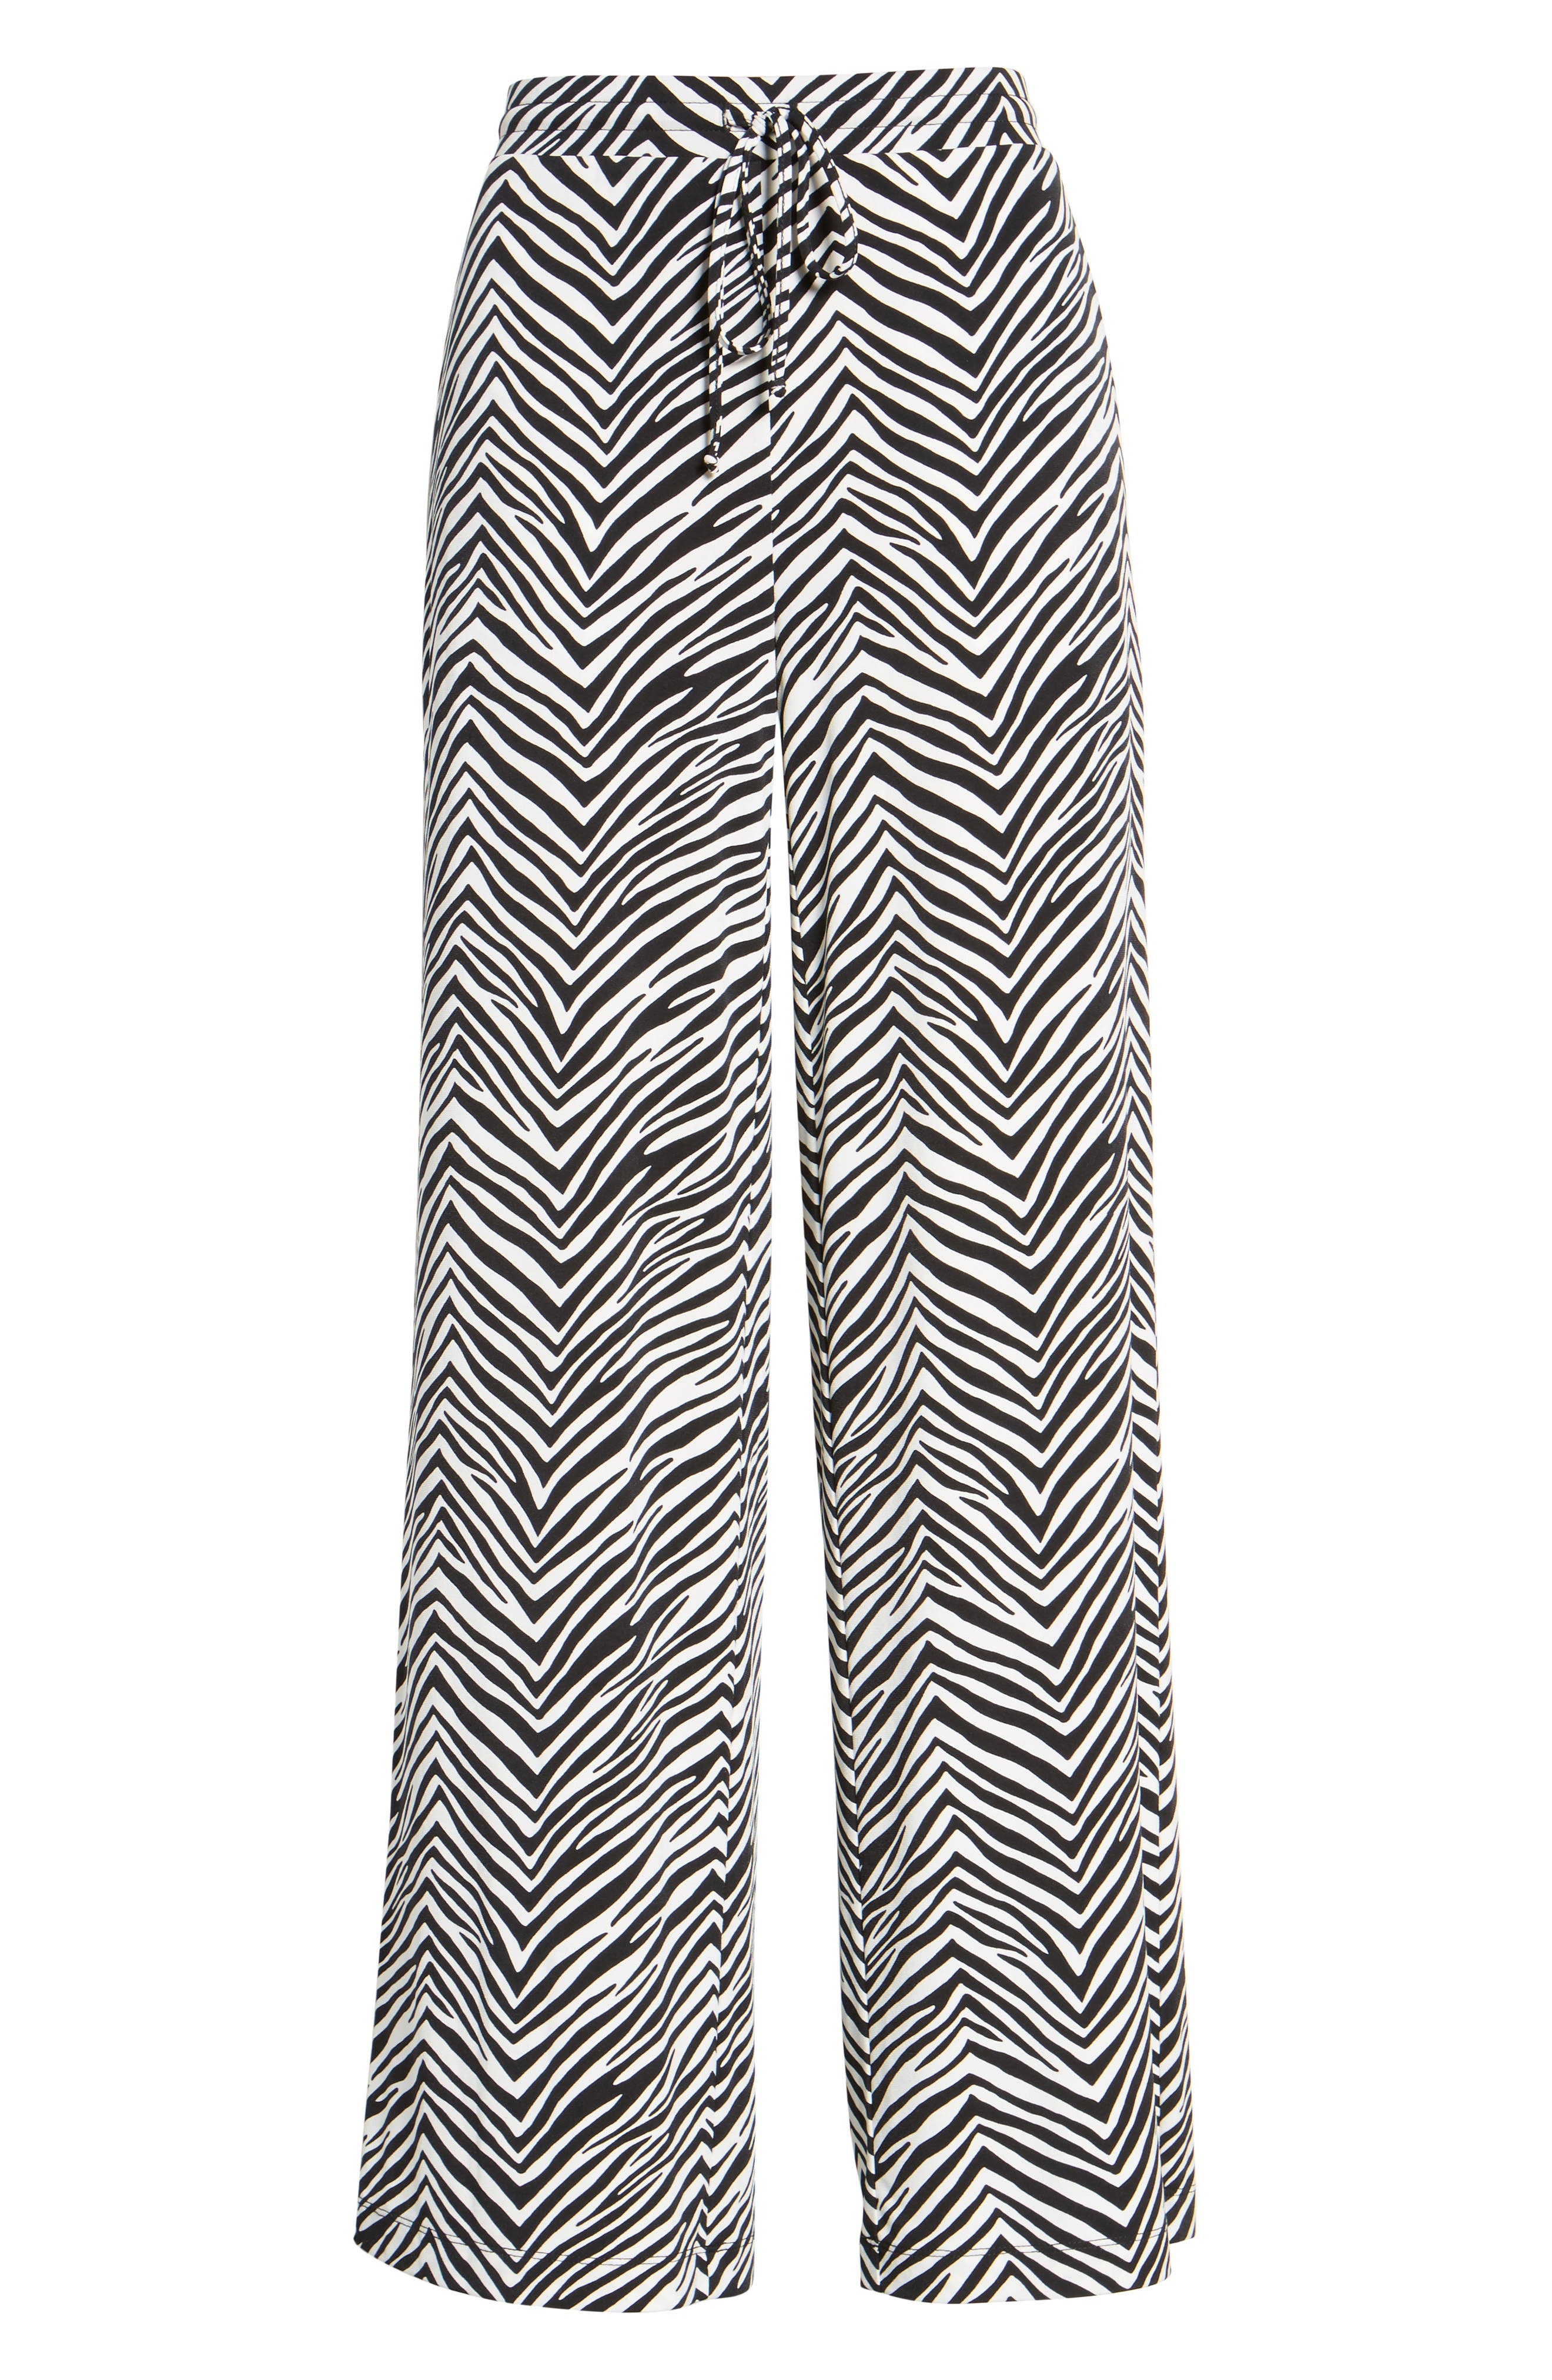 Zebra Print Drawstring Waist Pants,                             Alternate thumbnail 6, color,                             Rich Black